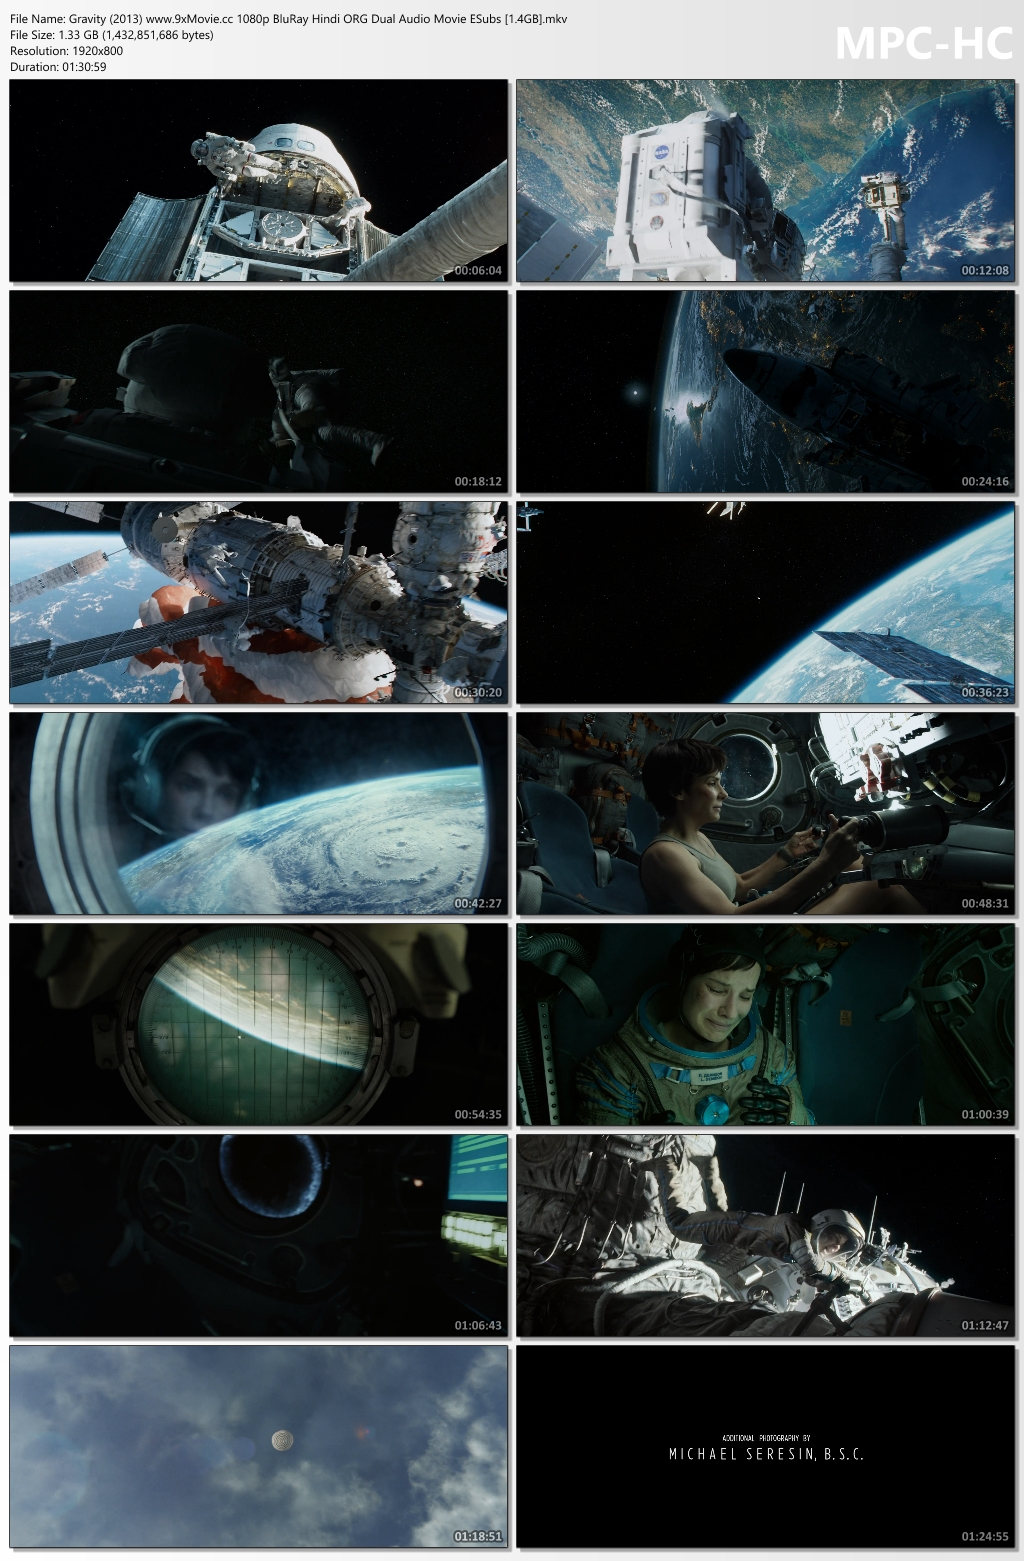 Gravity-2013-www-9x-Movie-cc-1080p-Blu-Ray-Hindi-ORG-Dual-Audio-Movie-ESubs-1-4-GB-mkv